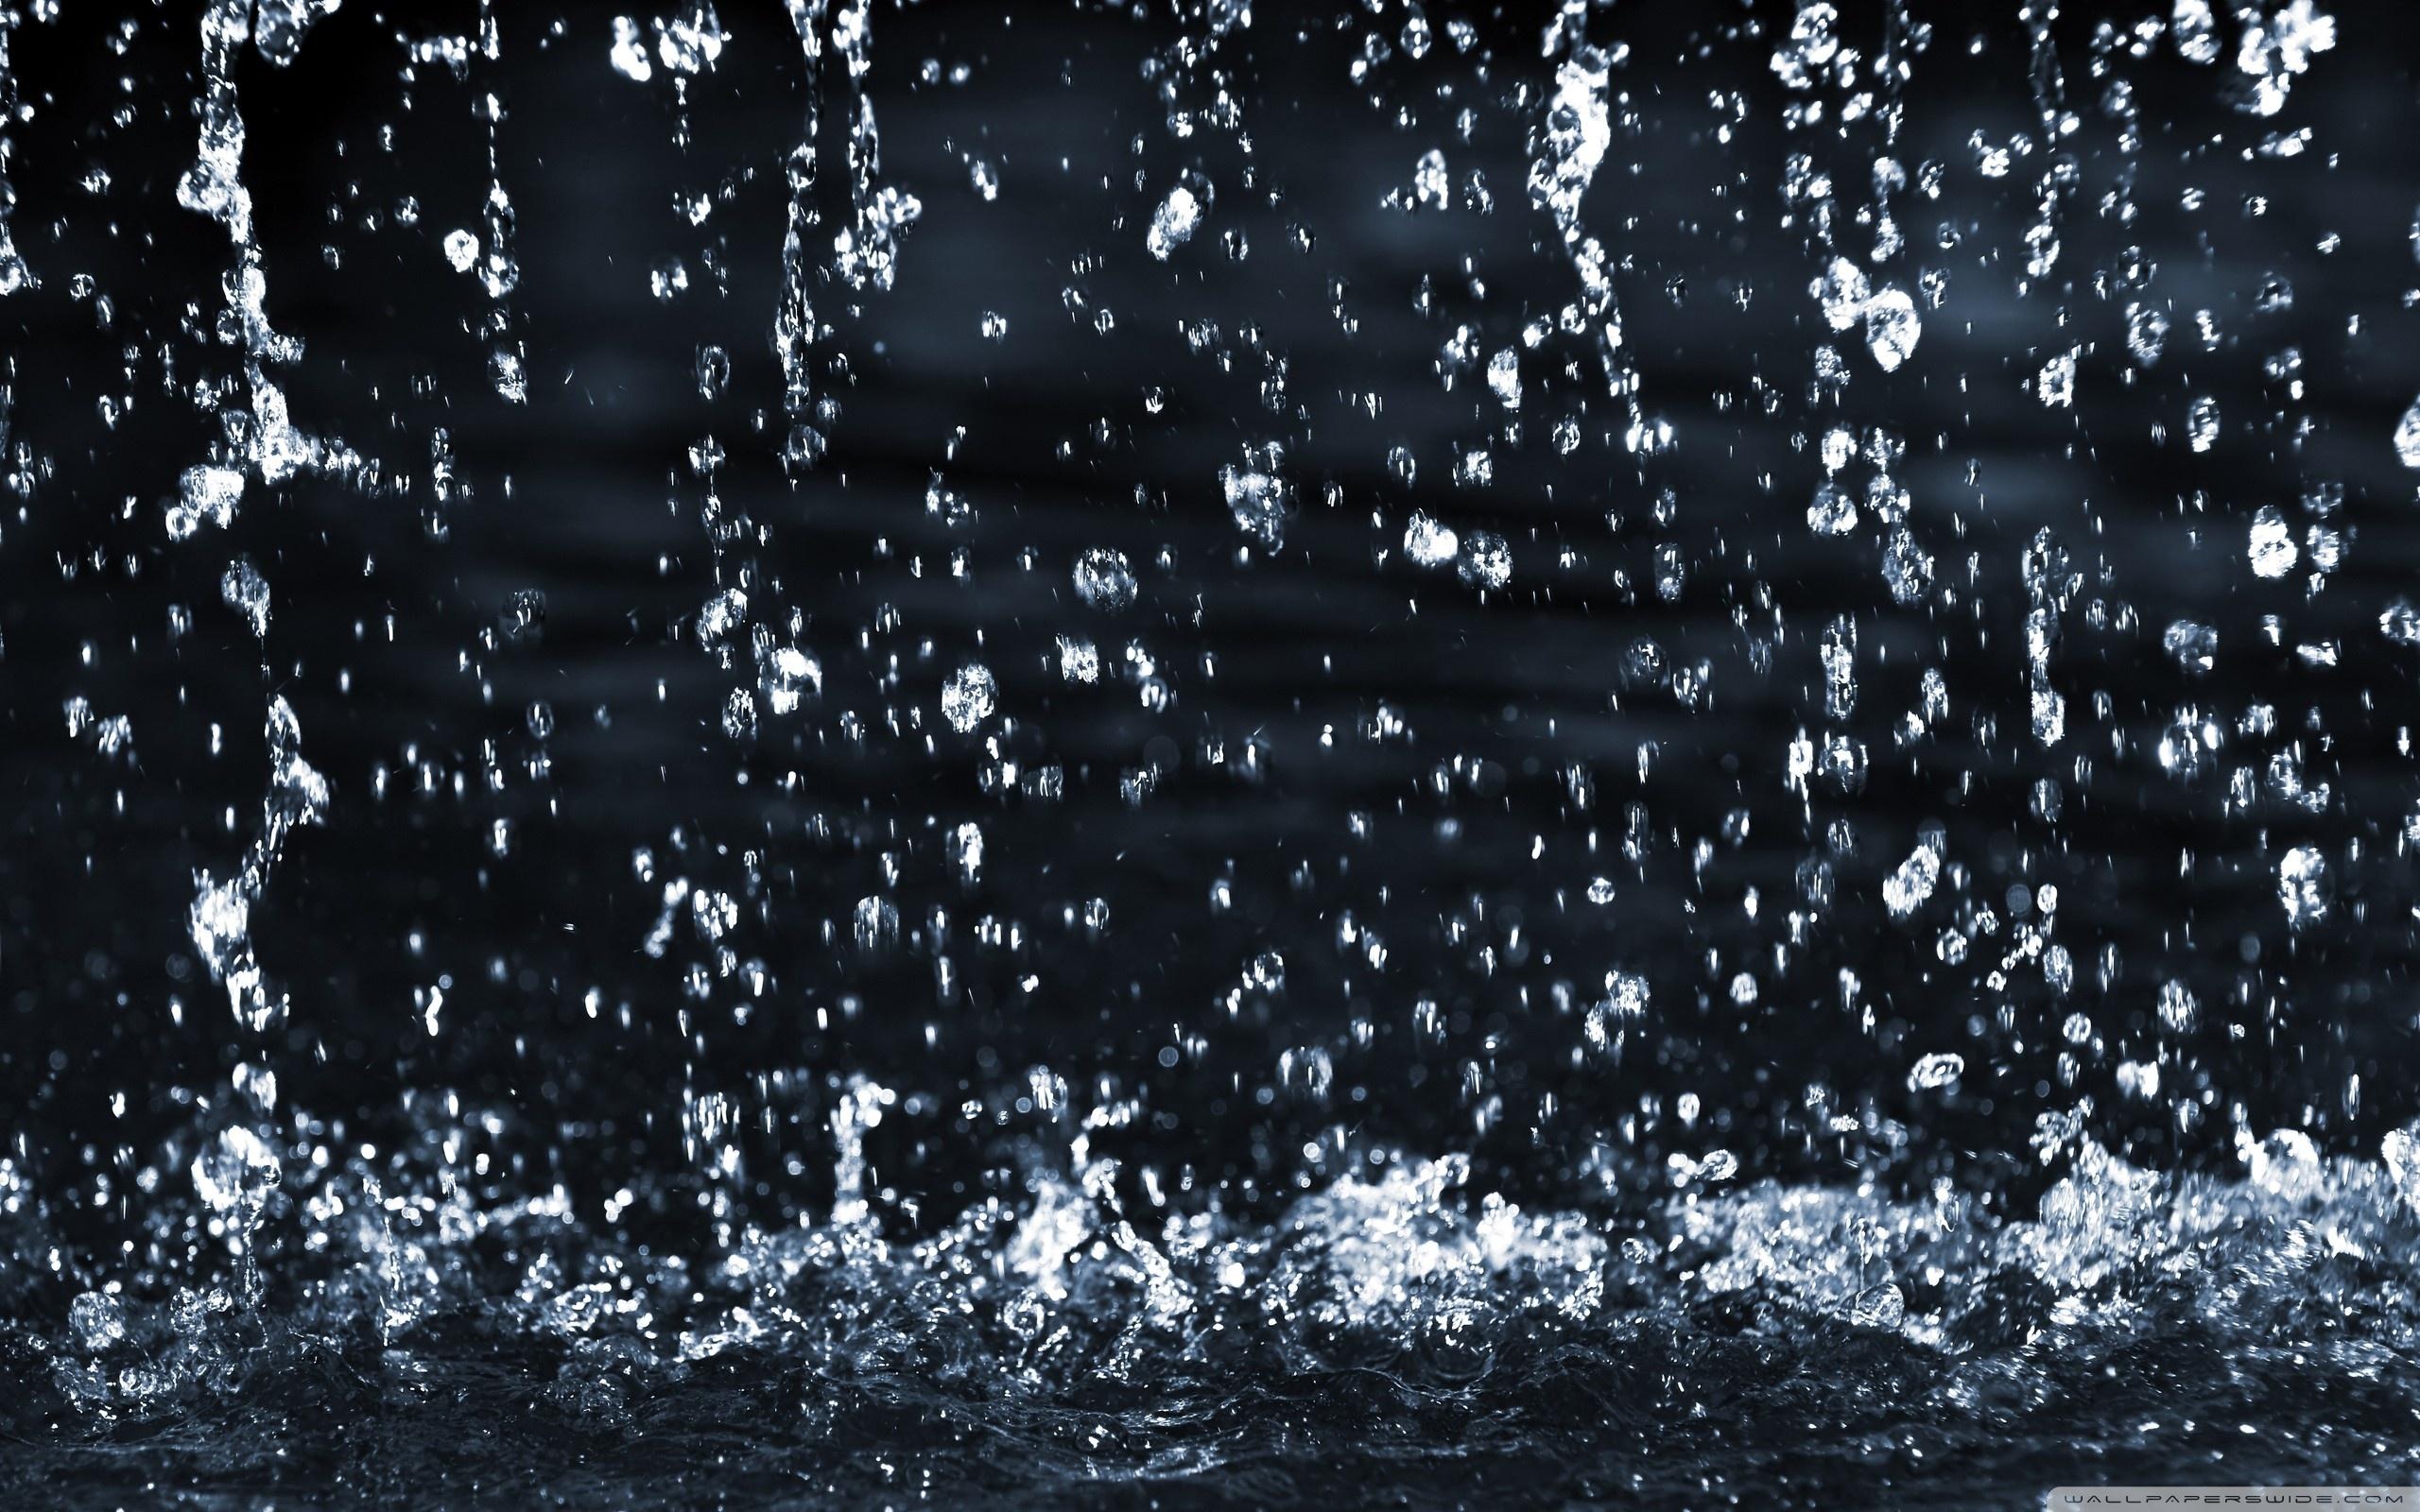 Rain wallpaper | 2560x1600 | #39316